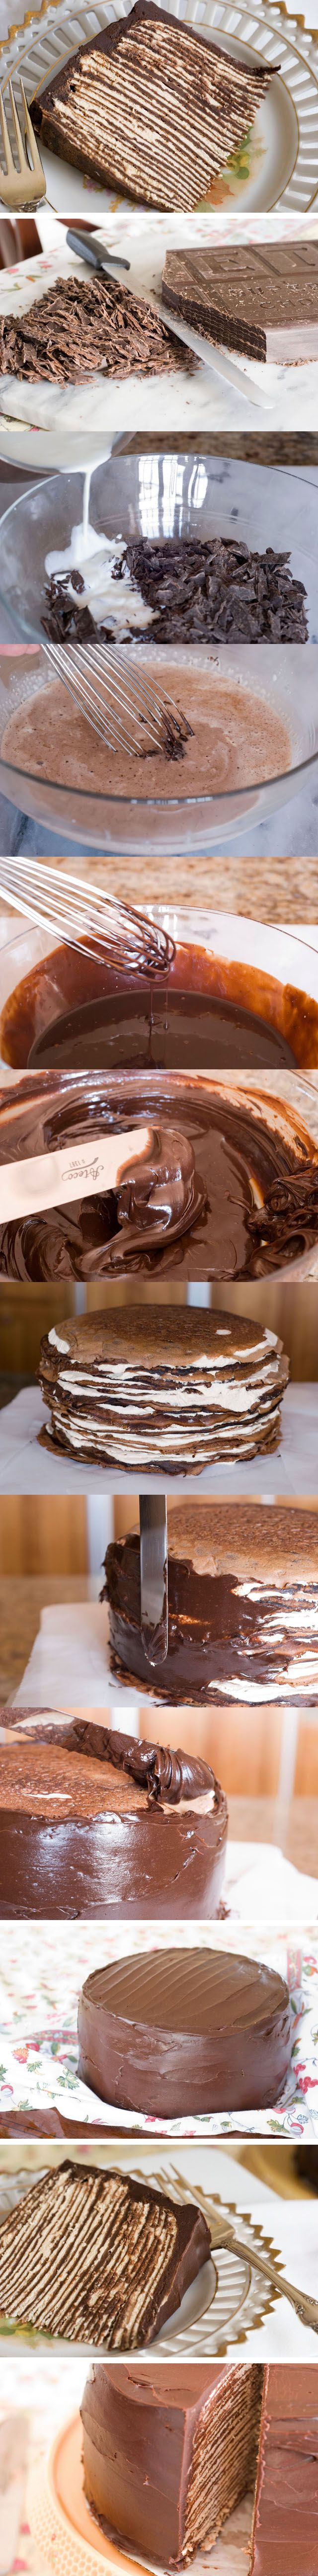 tarta-crepes-chocolate-pecados-reposteria-1